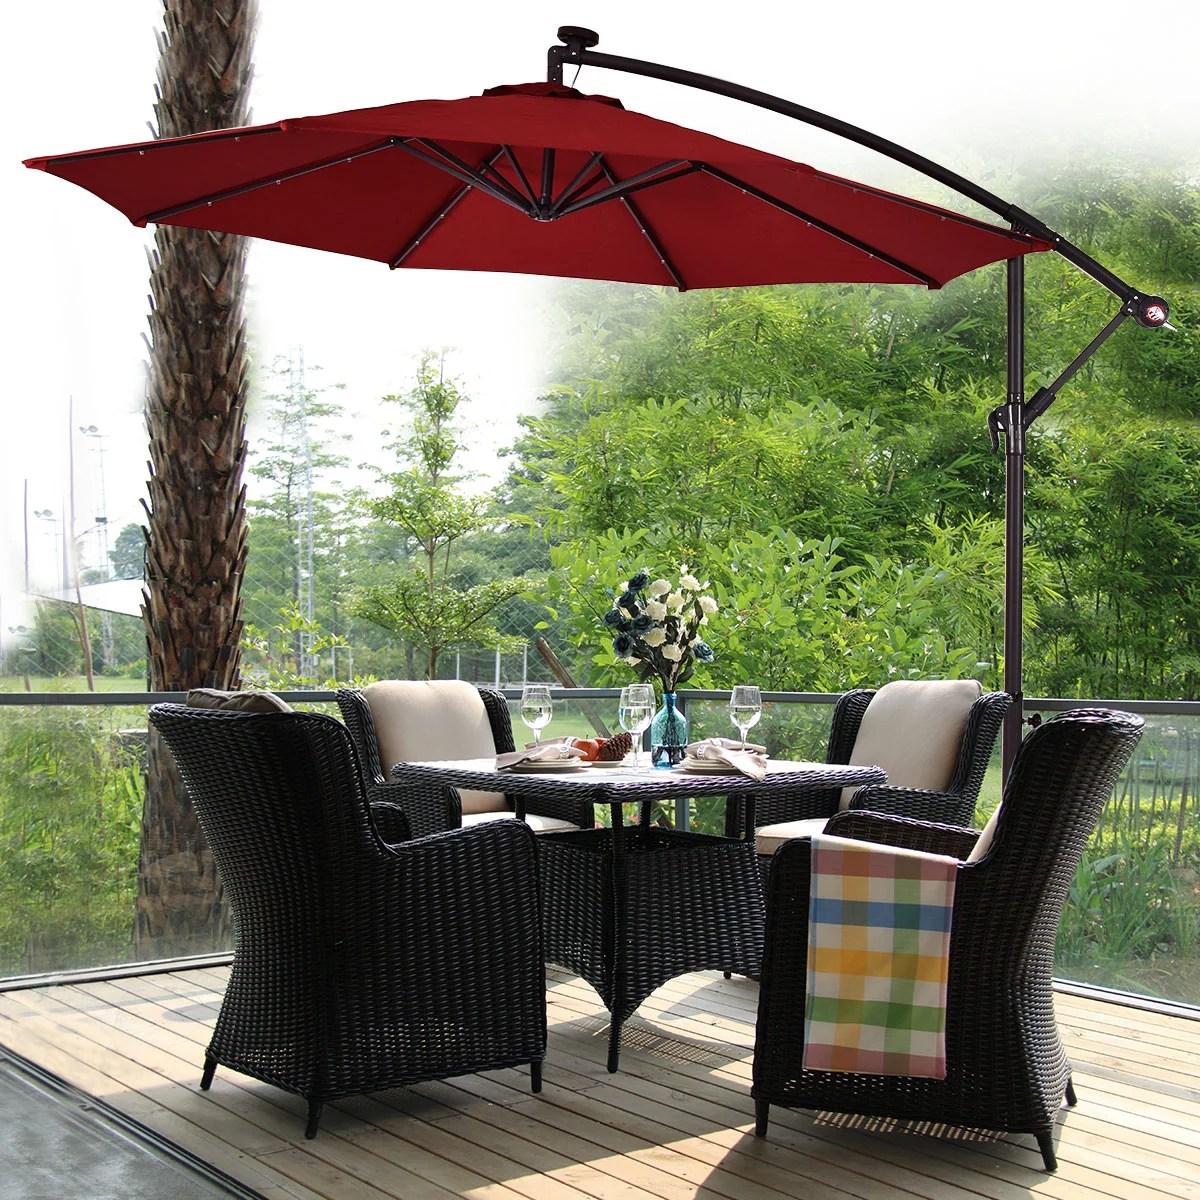 costway 10 hanging solar led umbrella patio sun shade offset market w base burgundy